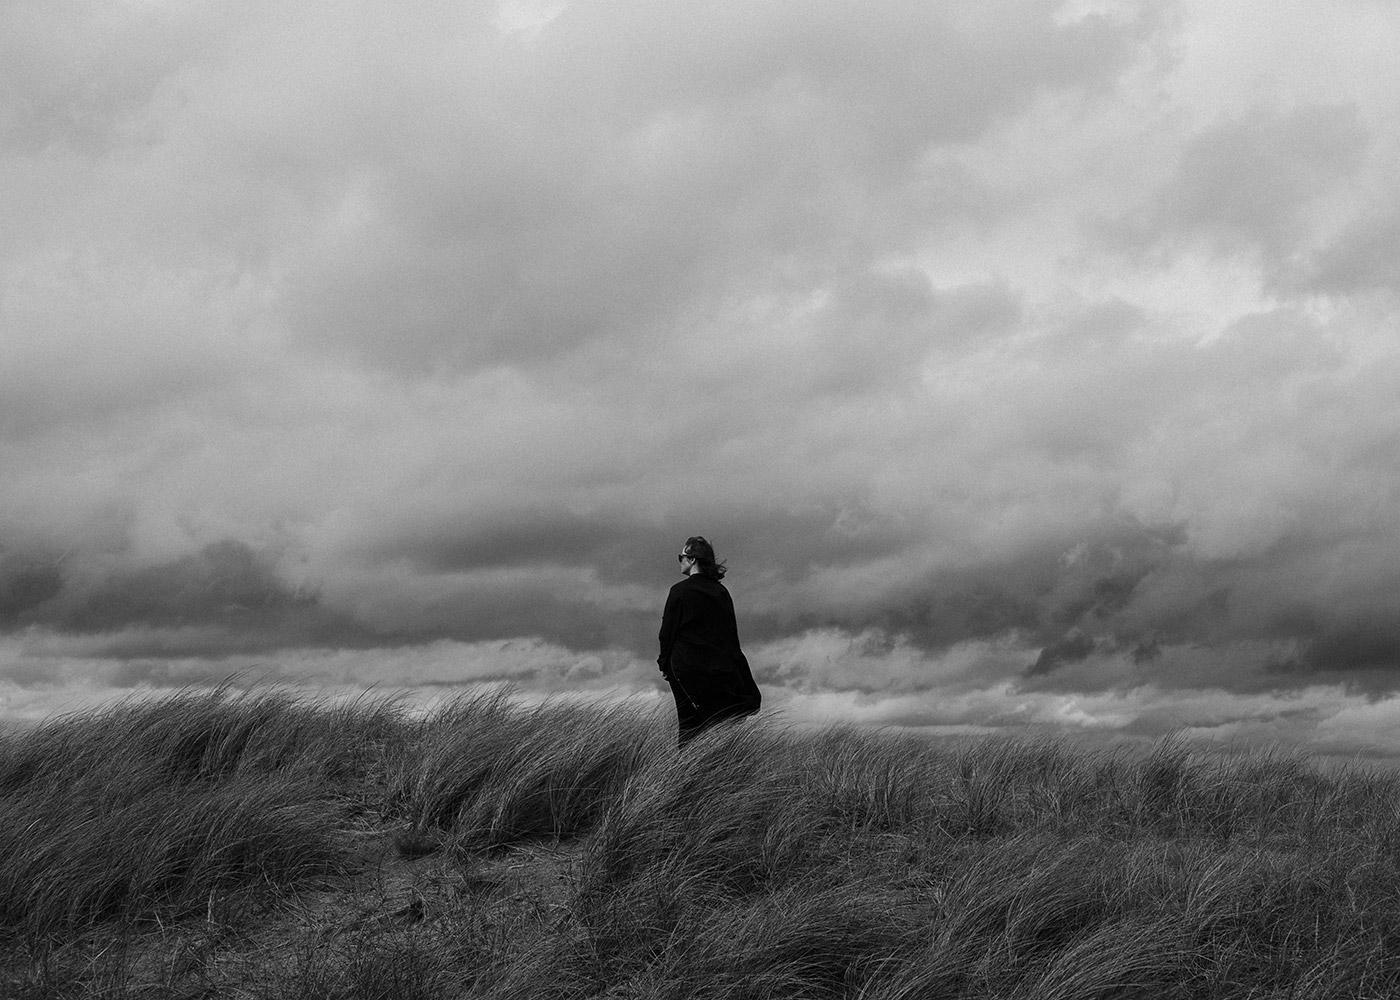 Gra black white photography